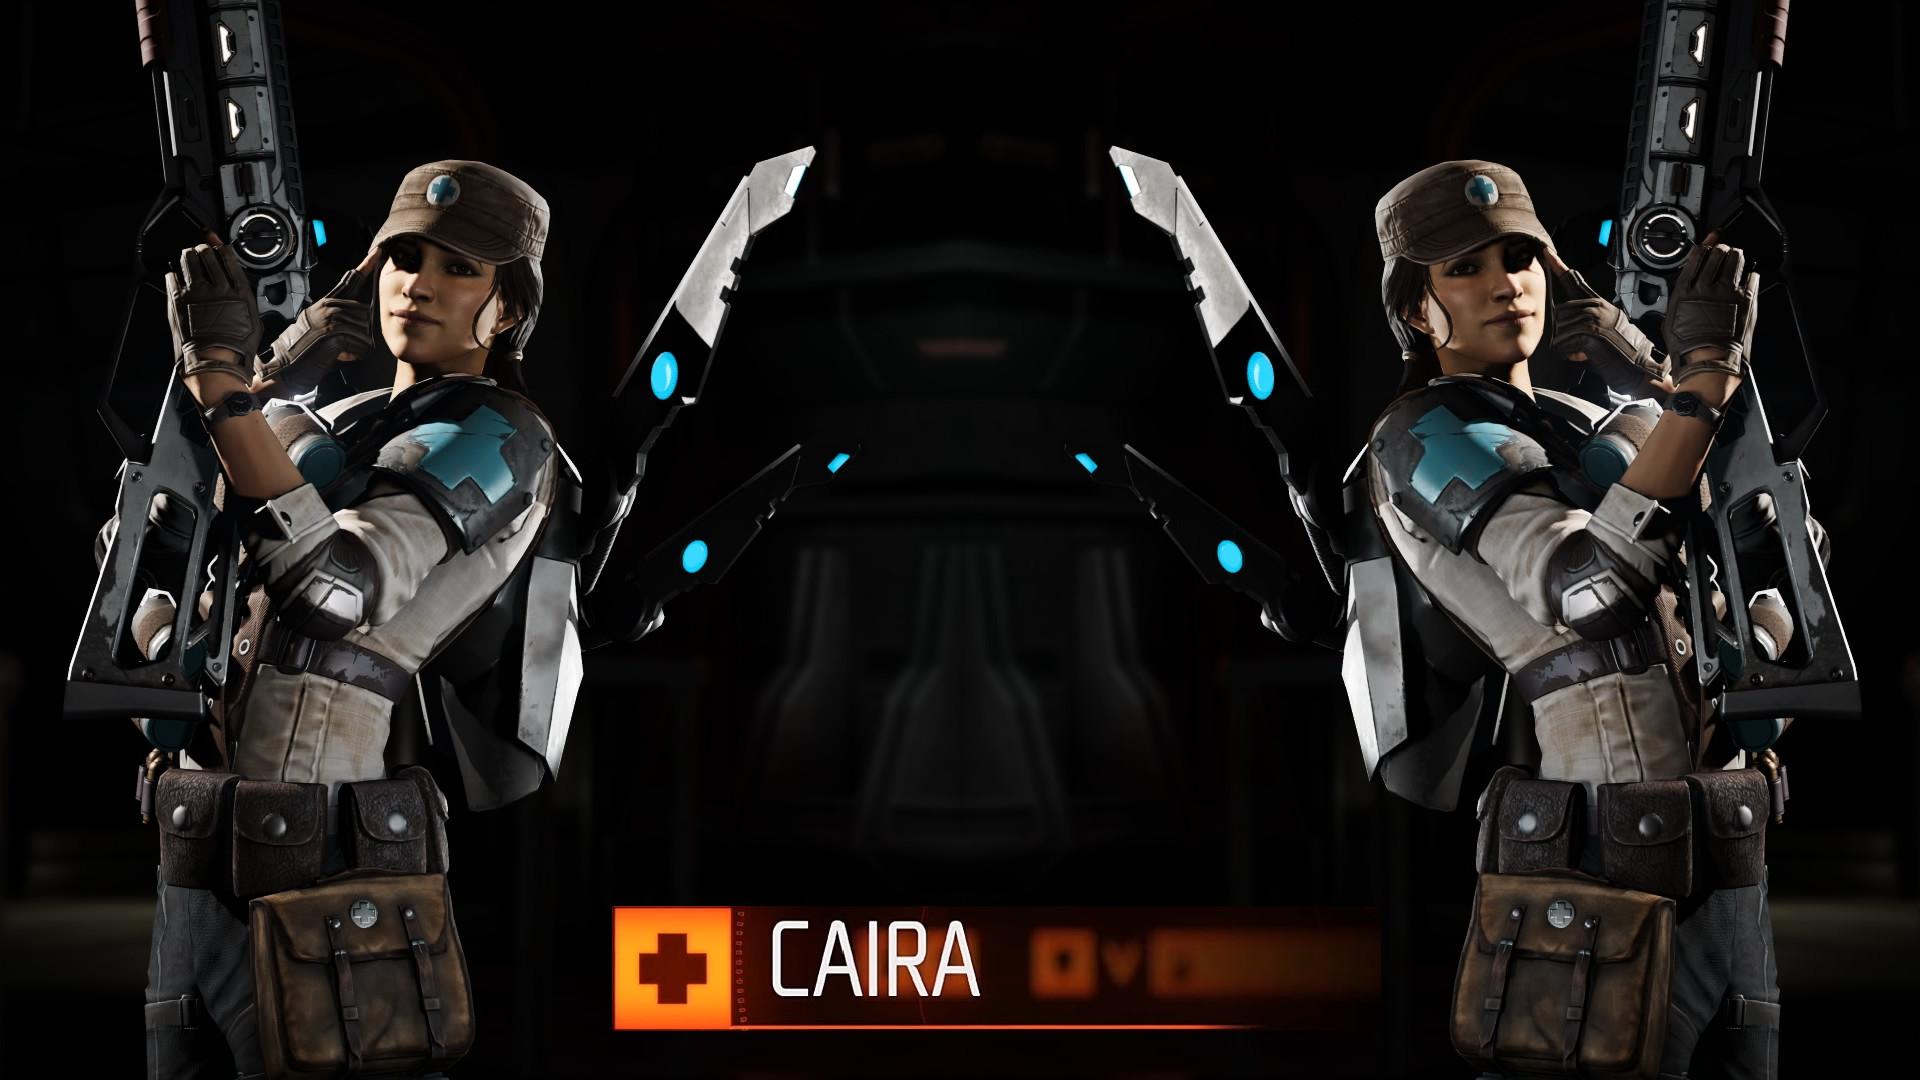 Evolve Caira Wallpaper 1080p by IDarkStalker Evolve Caira Wallpaper 1080p  by IDarkStalker